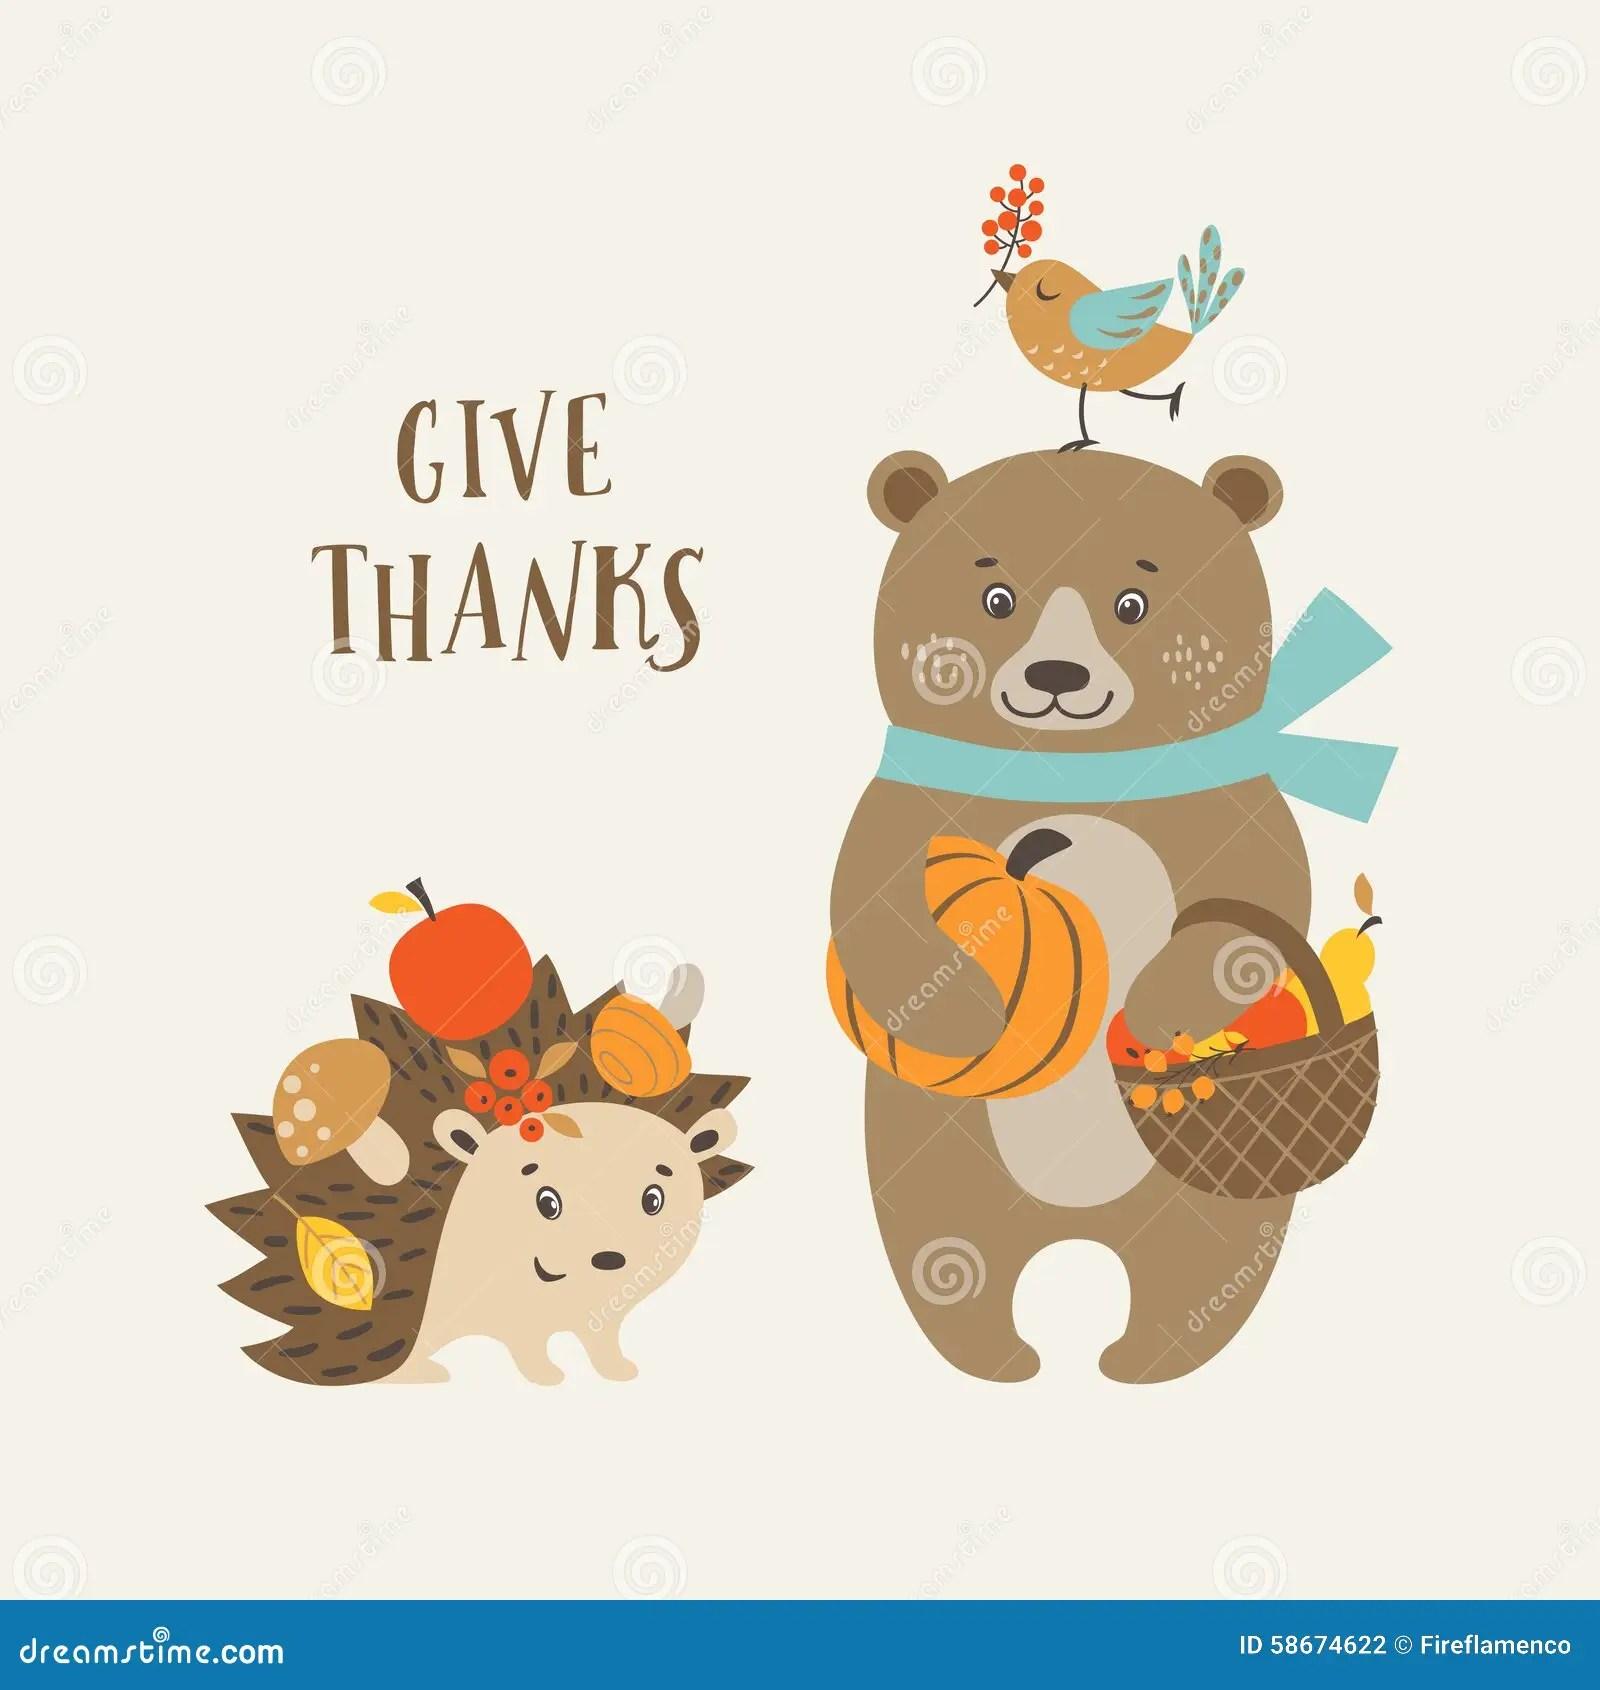 Cute Thanksgiving Card Stock Vector Illustration Of Season 58674622